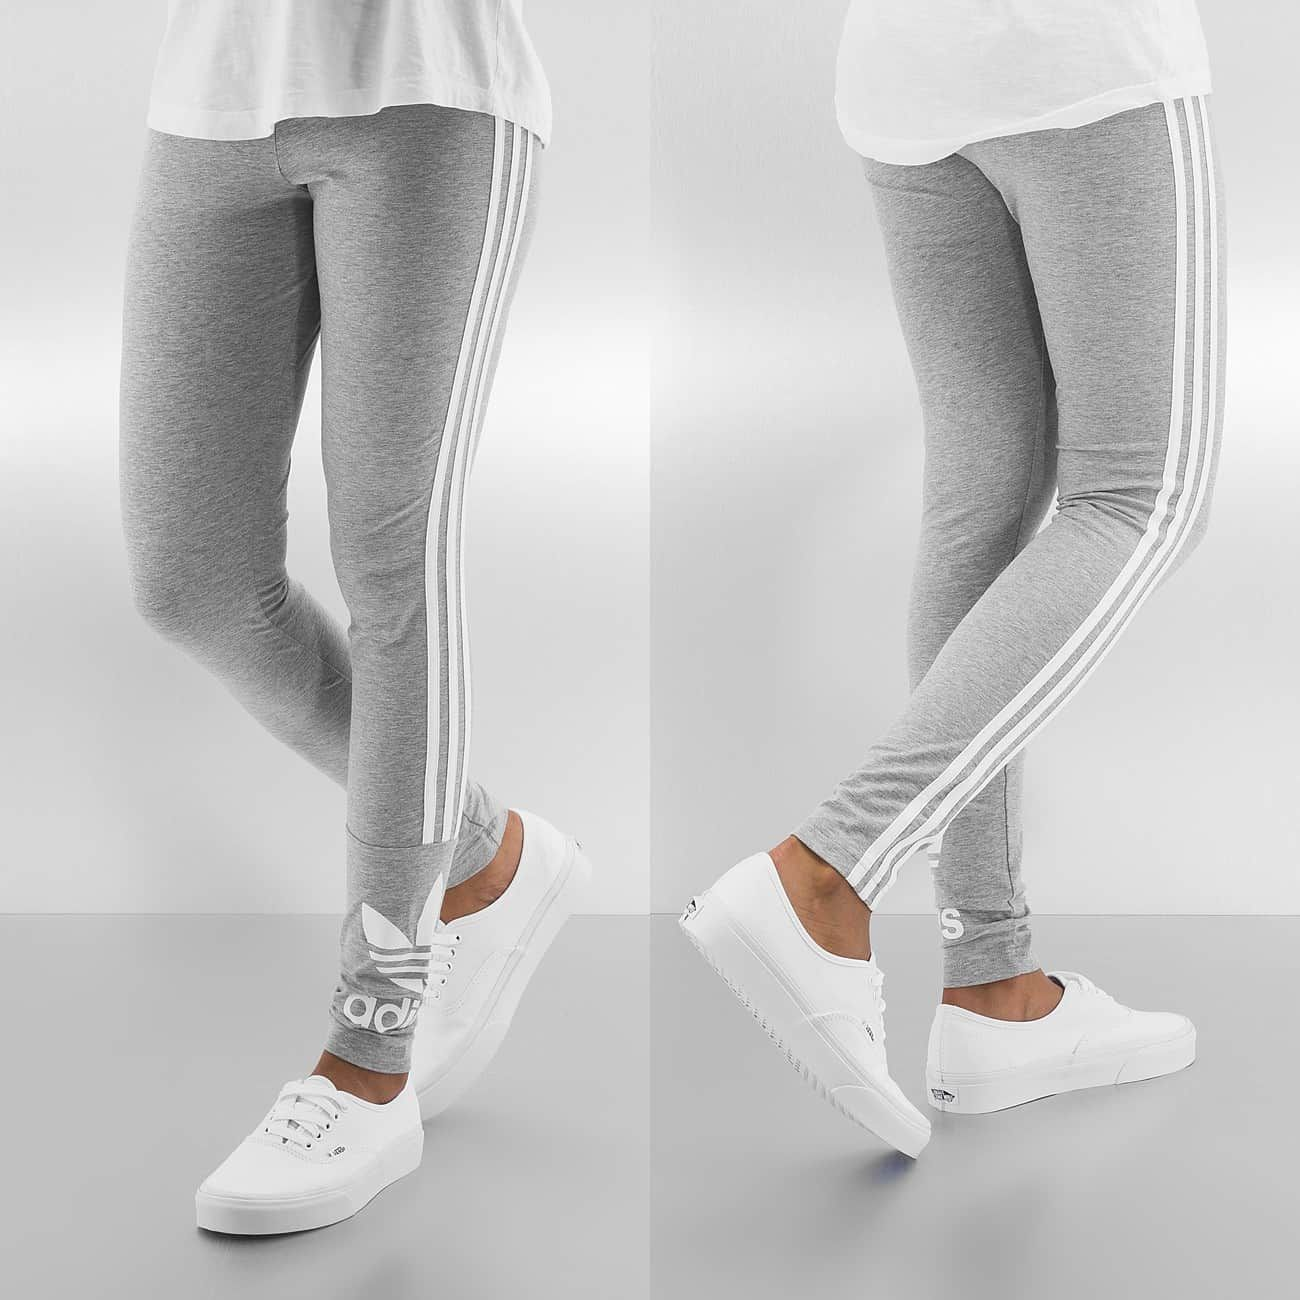 adidas legging grau fit wear pinterest sport und. Black Bedroom Furniture Sets. Home Design Ideas